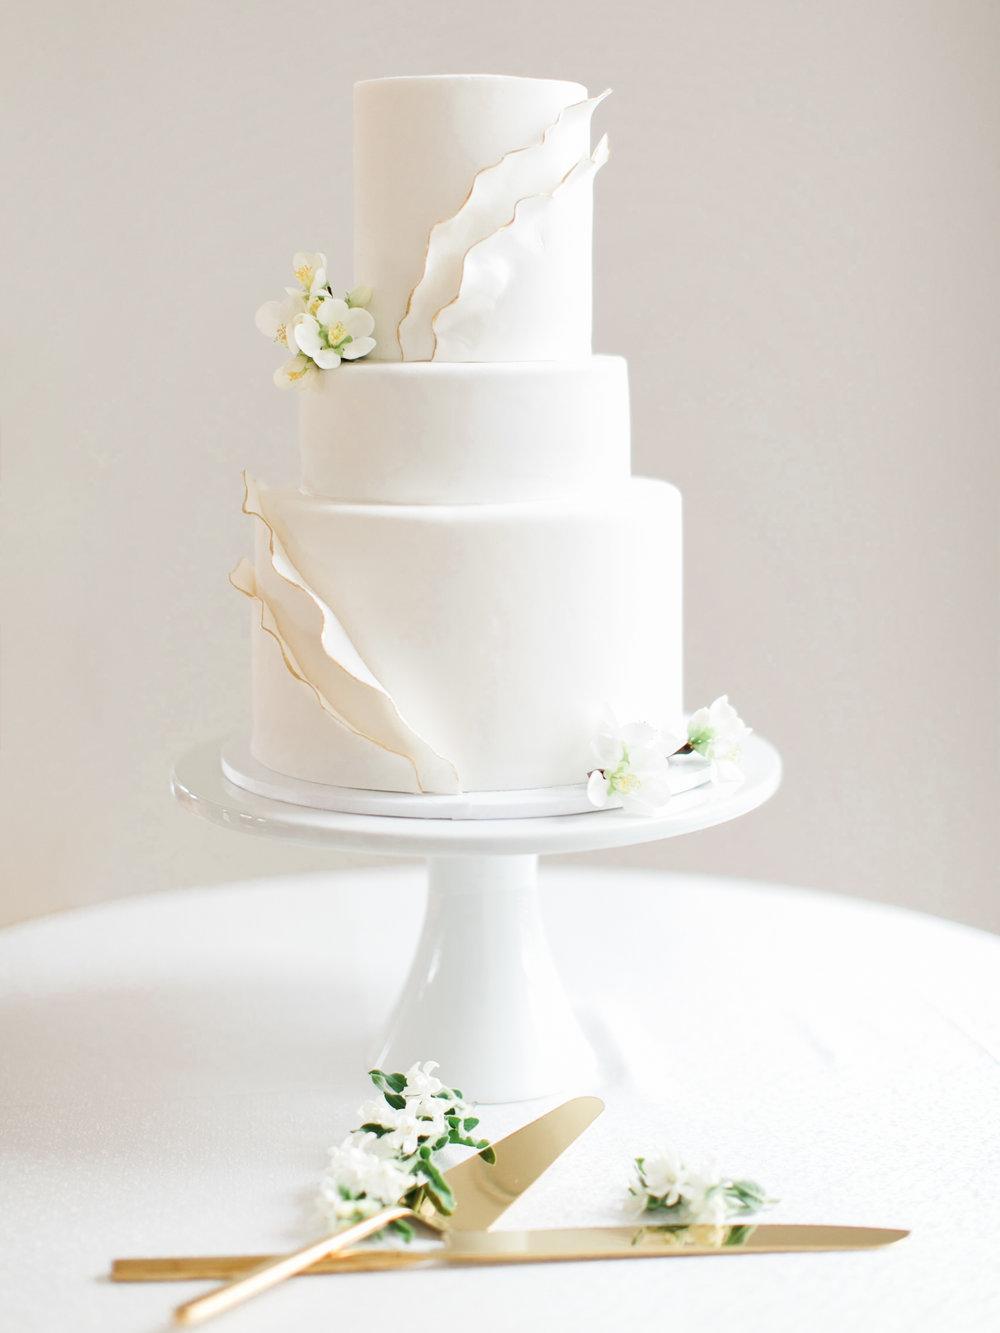 asher-gardner-photography-bryant-park-wedding-00344.jpg